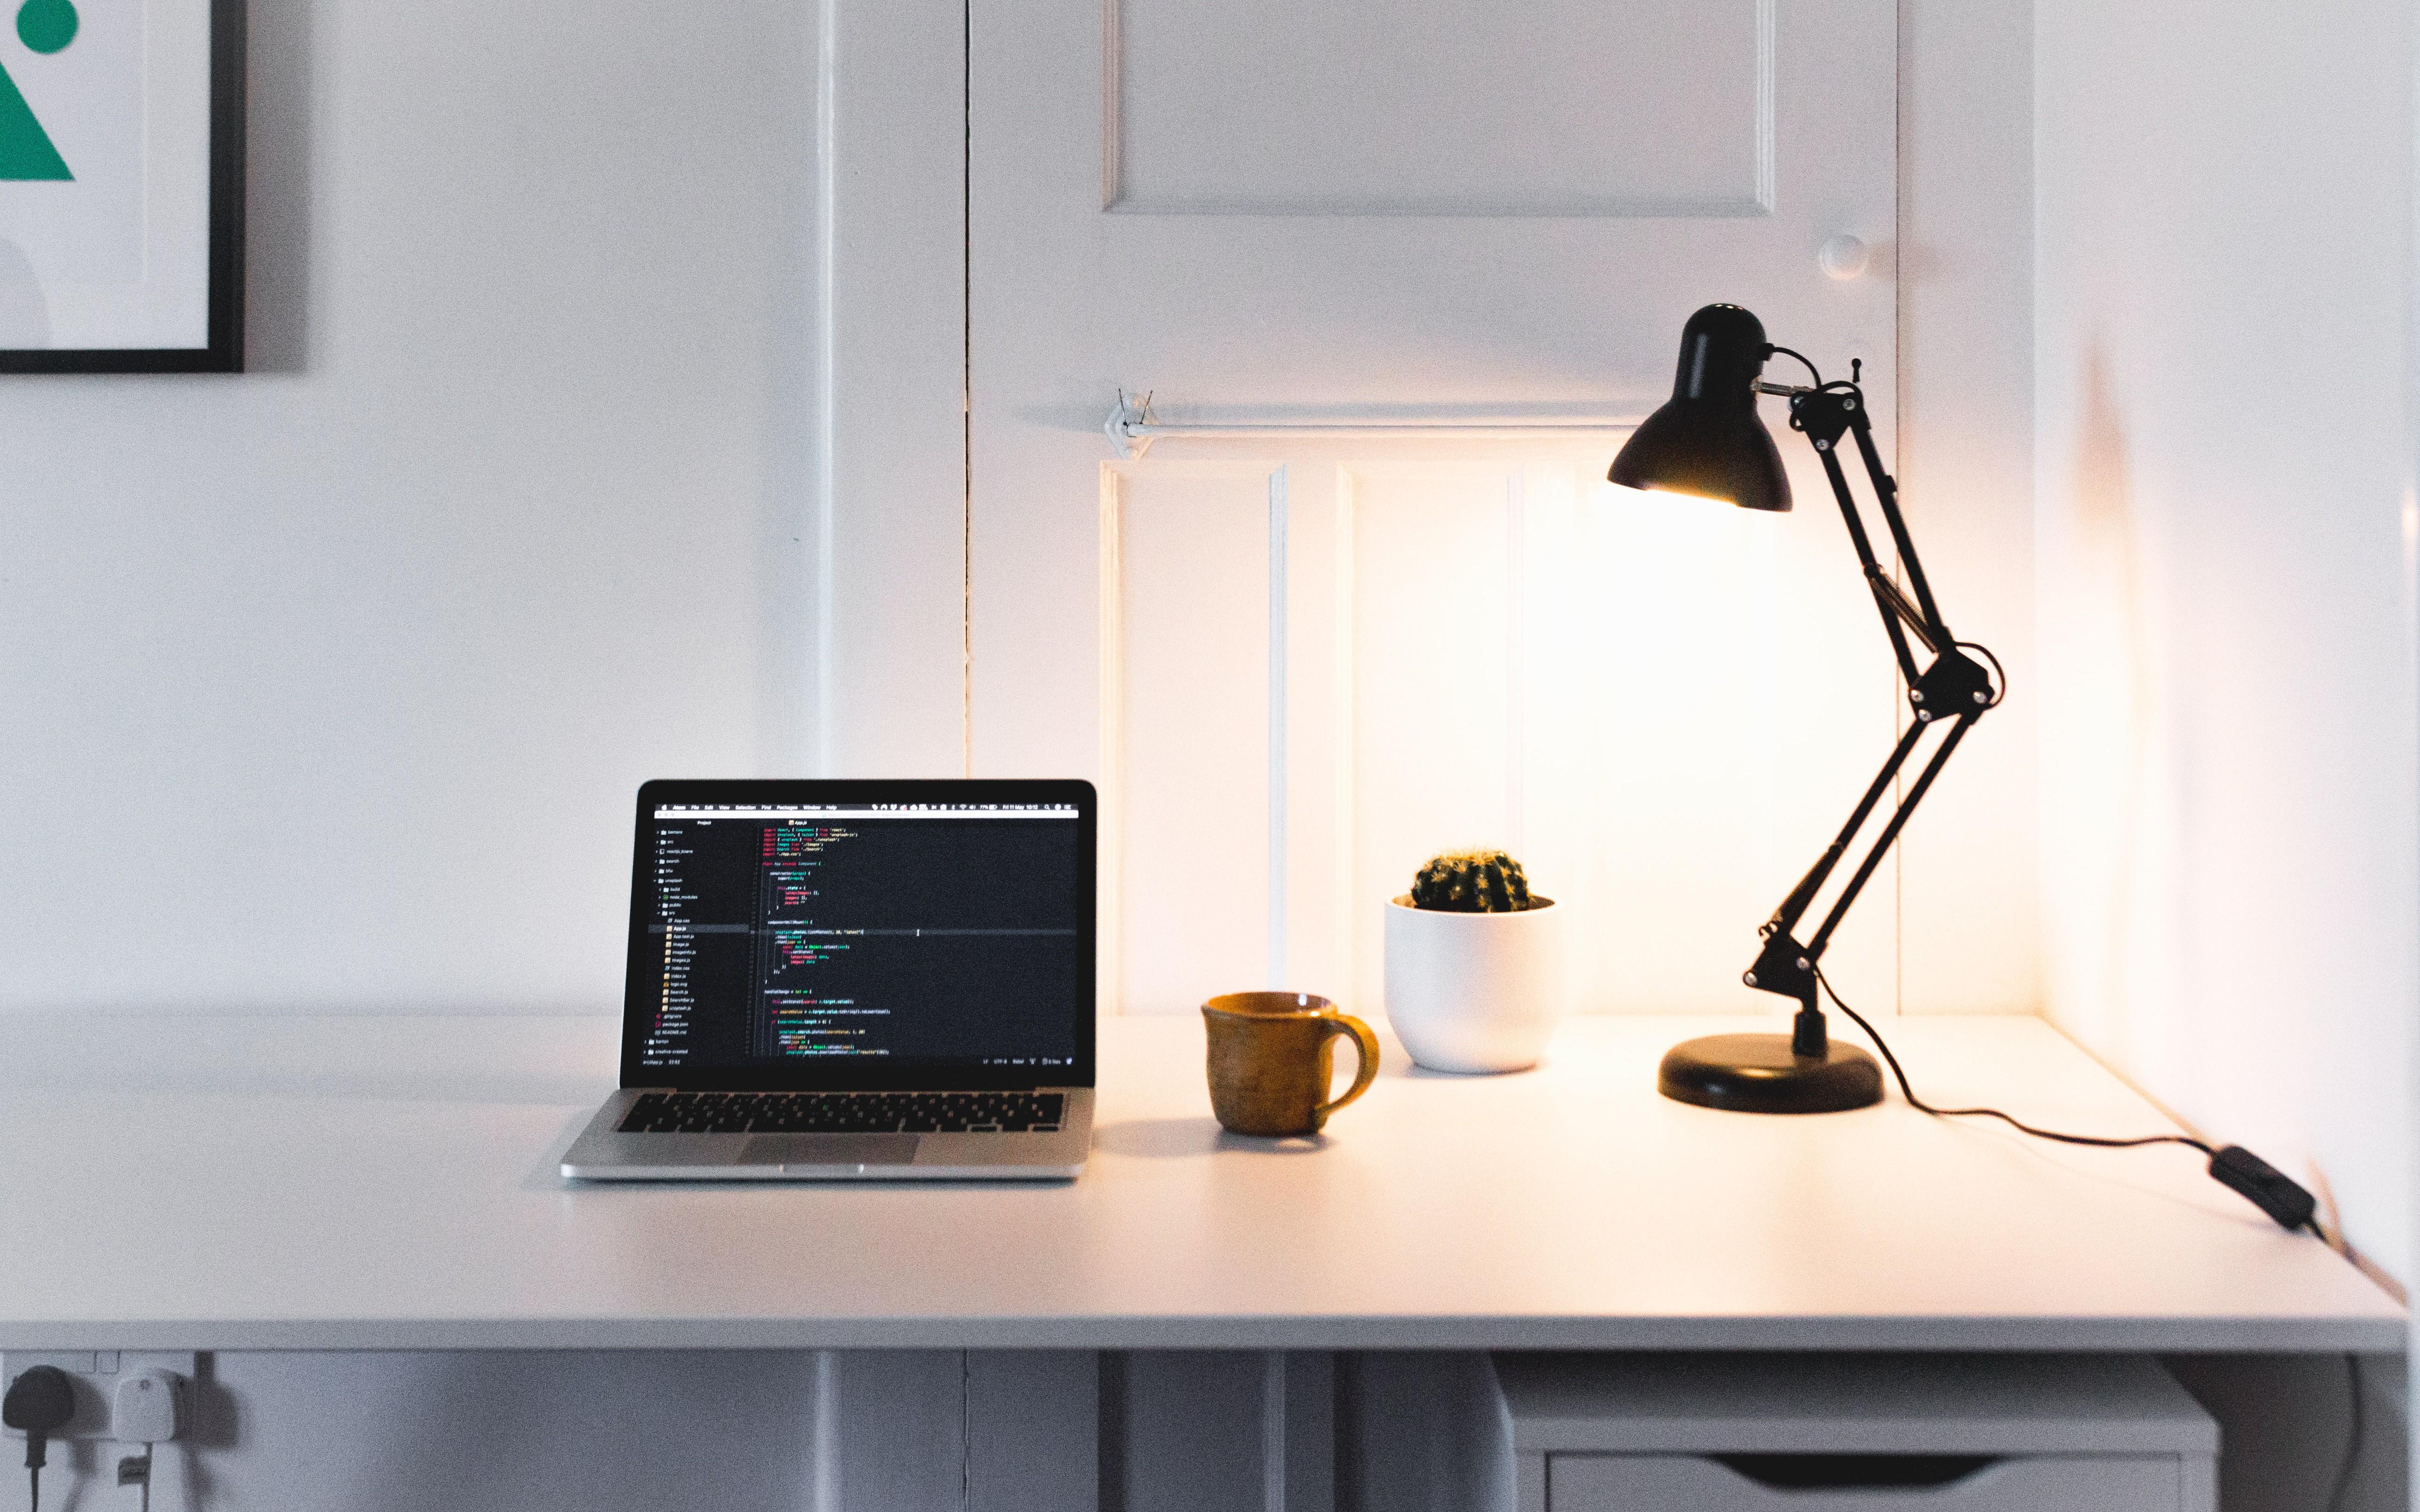 Building a Node js Service With AWS Lambda, DynamoDB, and Serverless